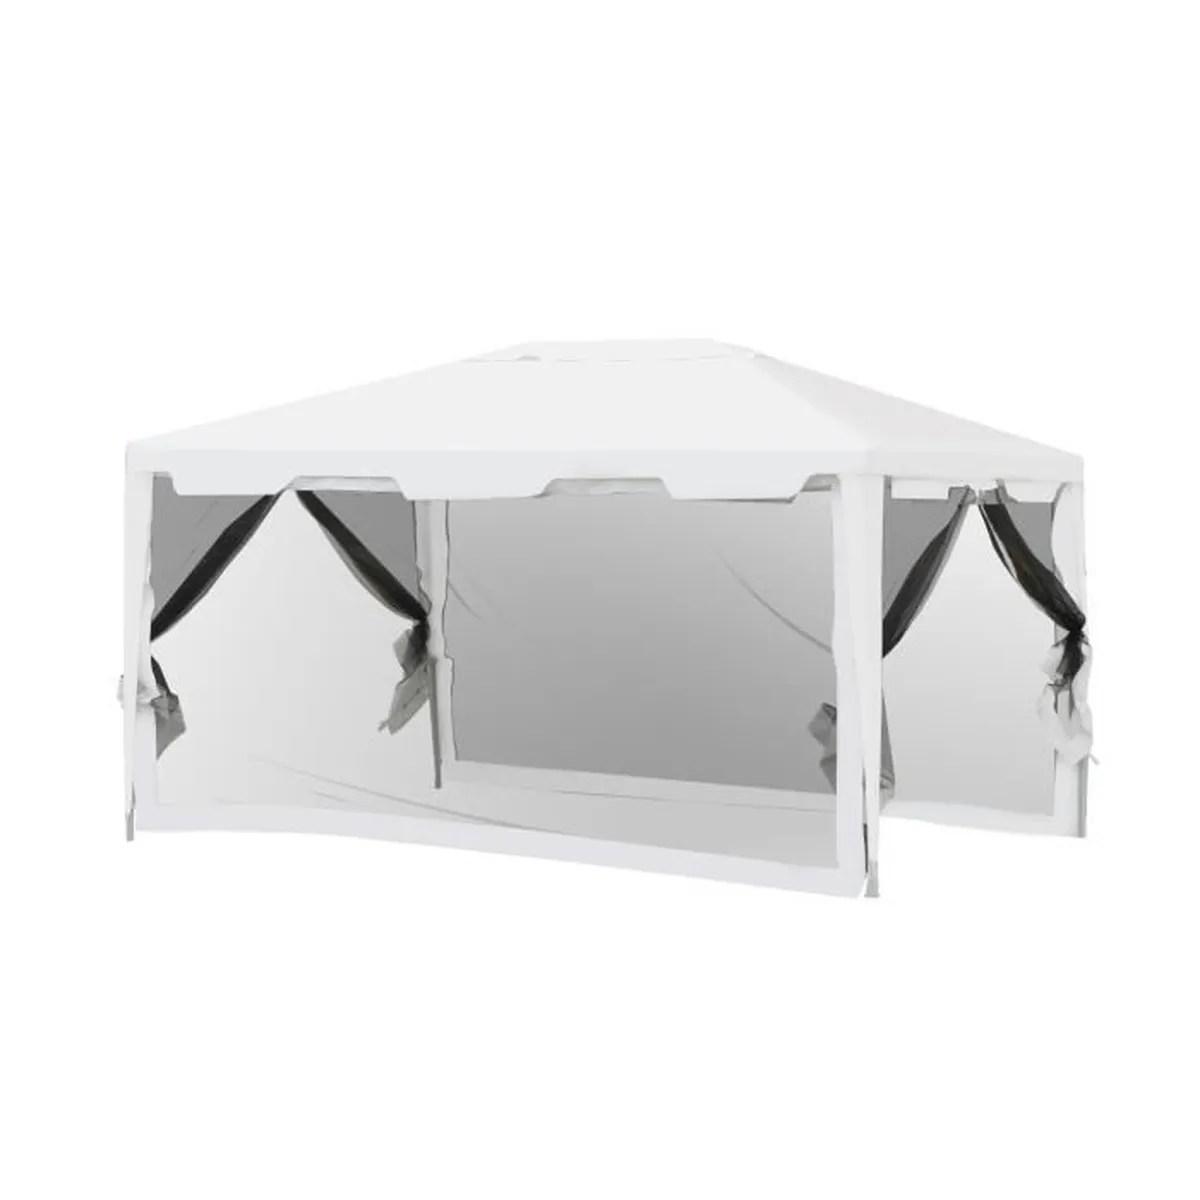 Awesome Tente De Jardin Auchan Pictures - House Design - marcomilone.com